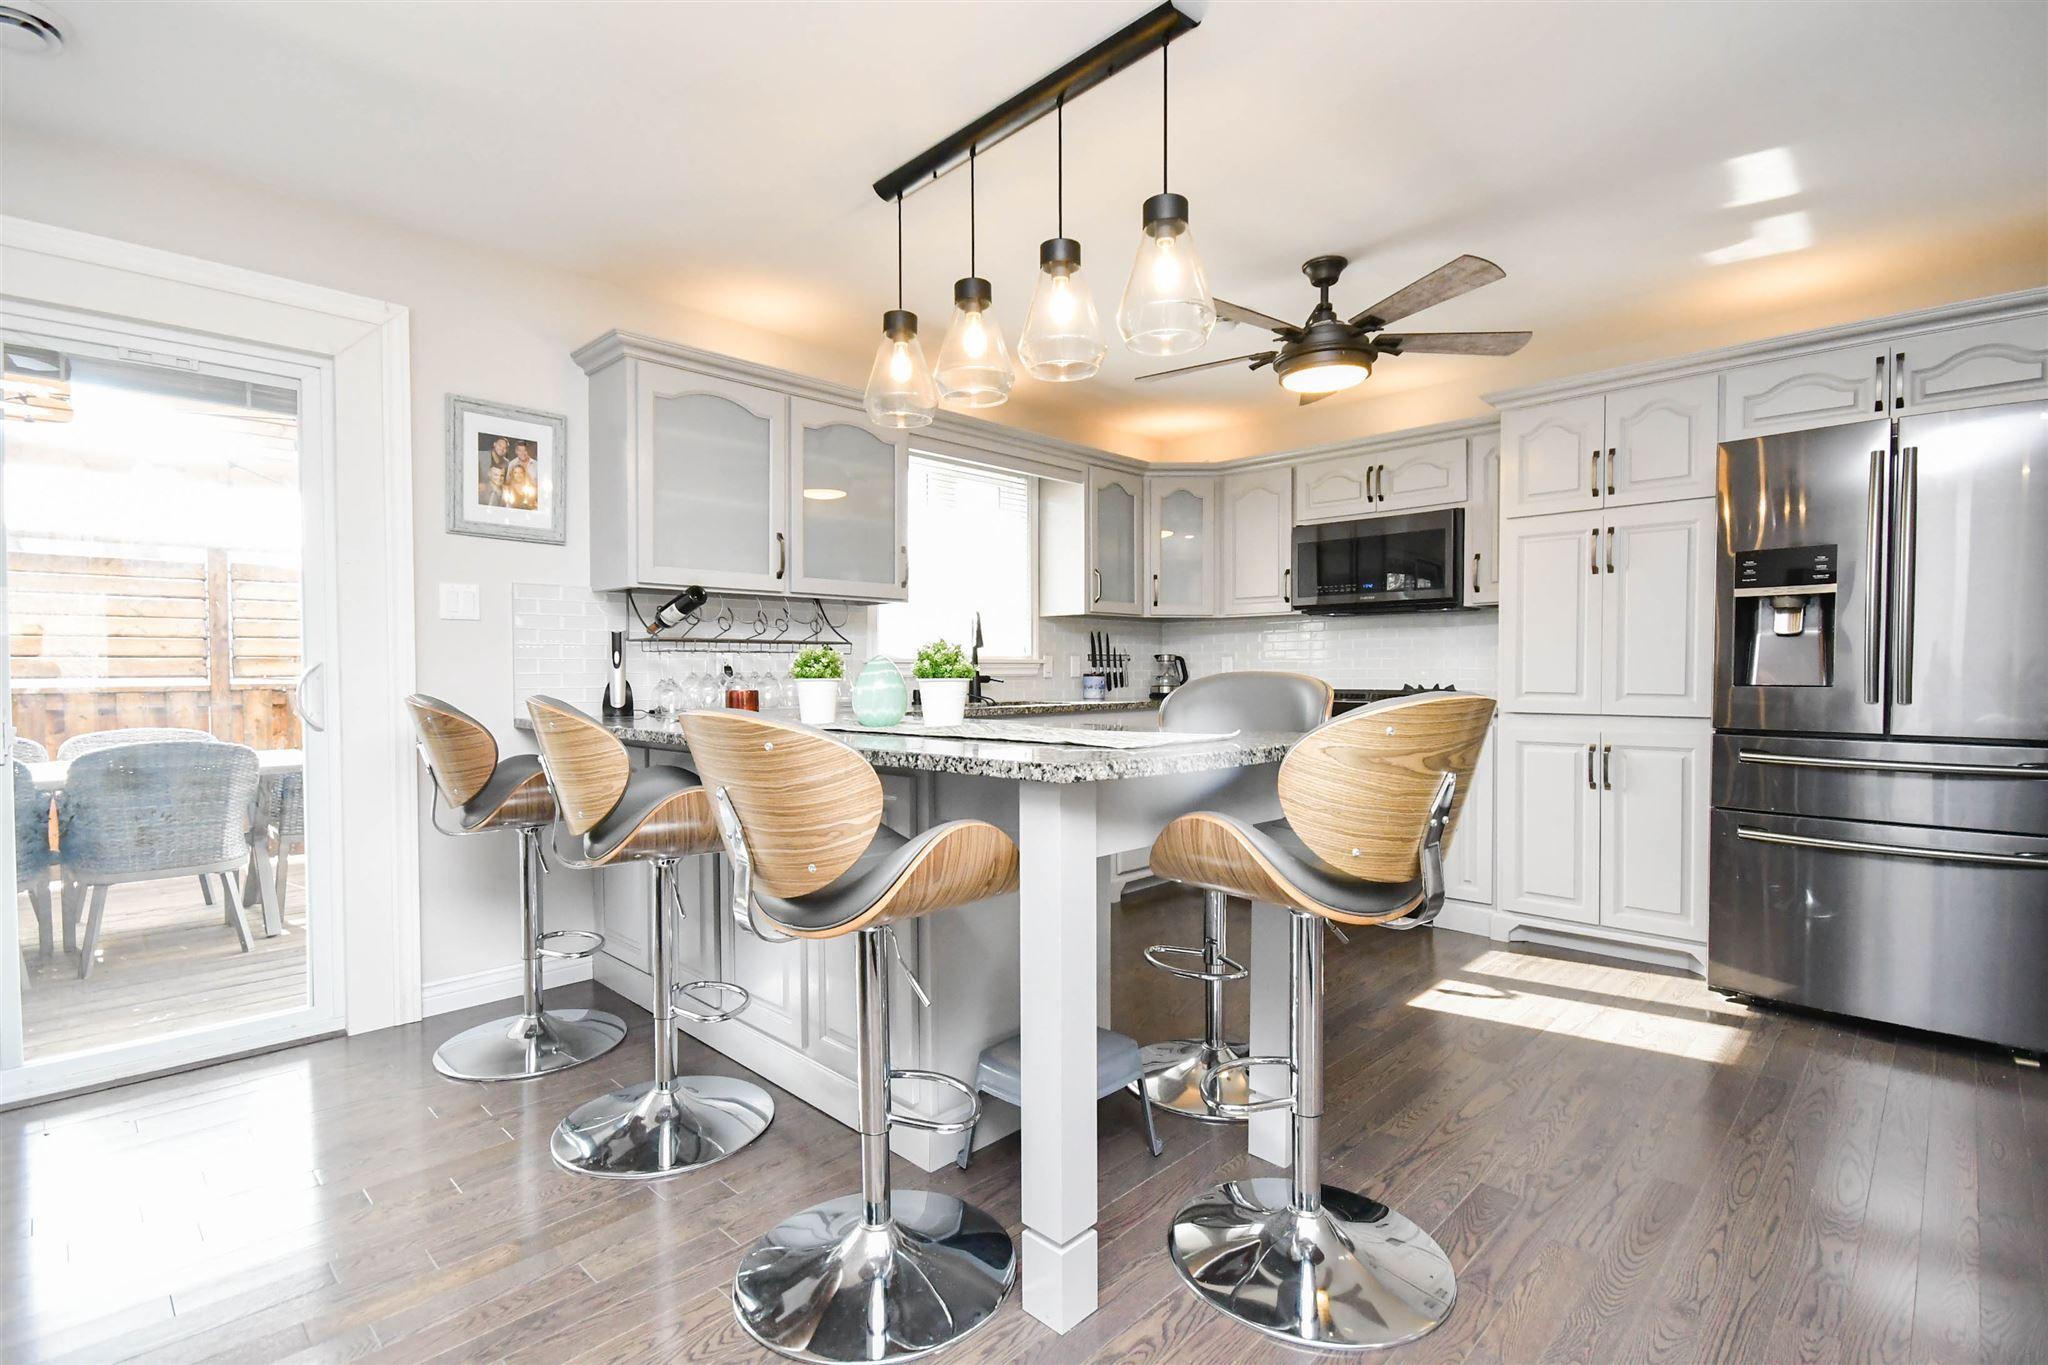 Photo 8: Photos: 17 Armstrong Court in Halifax: 5-Fairmount, Clayton Park, Rockingham Residential for sale (Halifax-Dartmouth)  : MLS®# 202105075